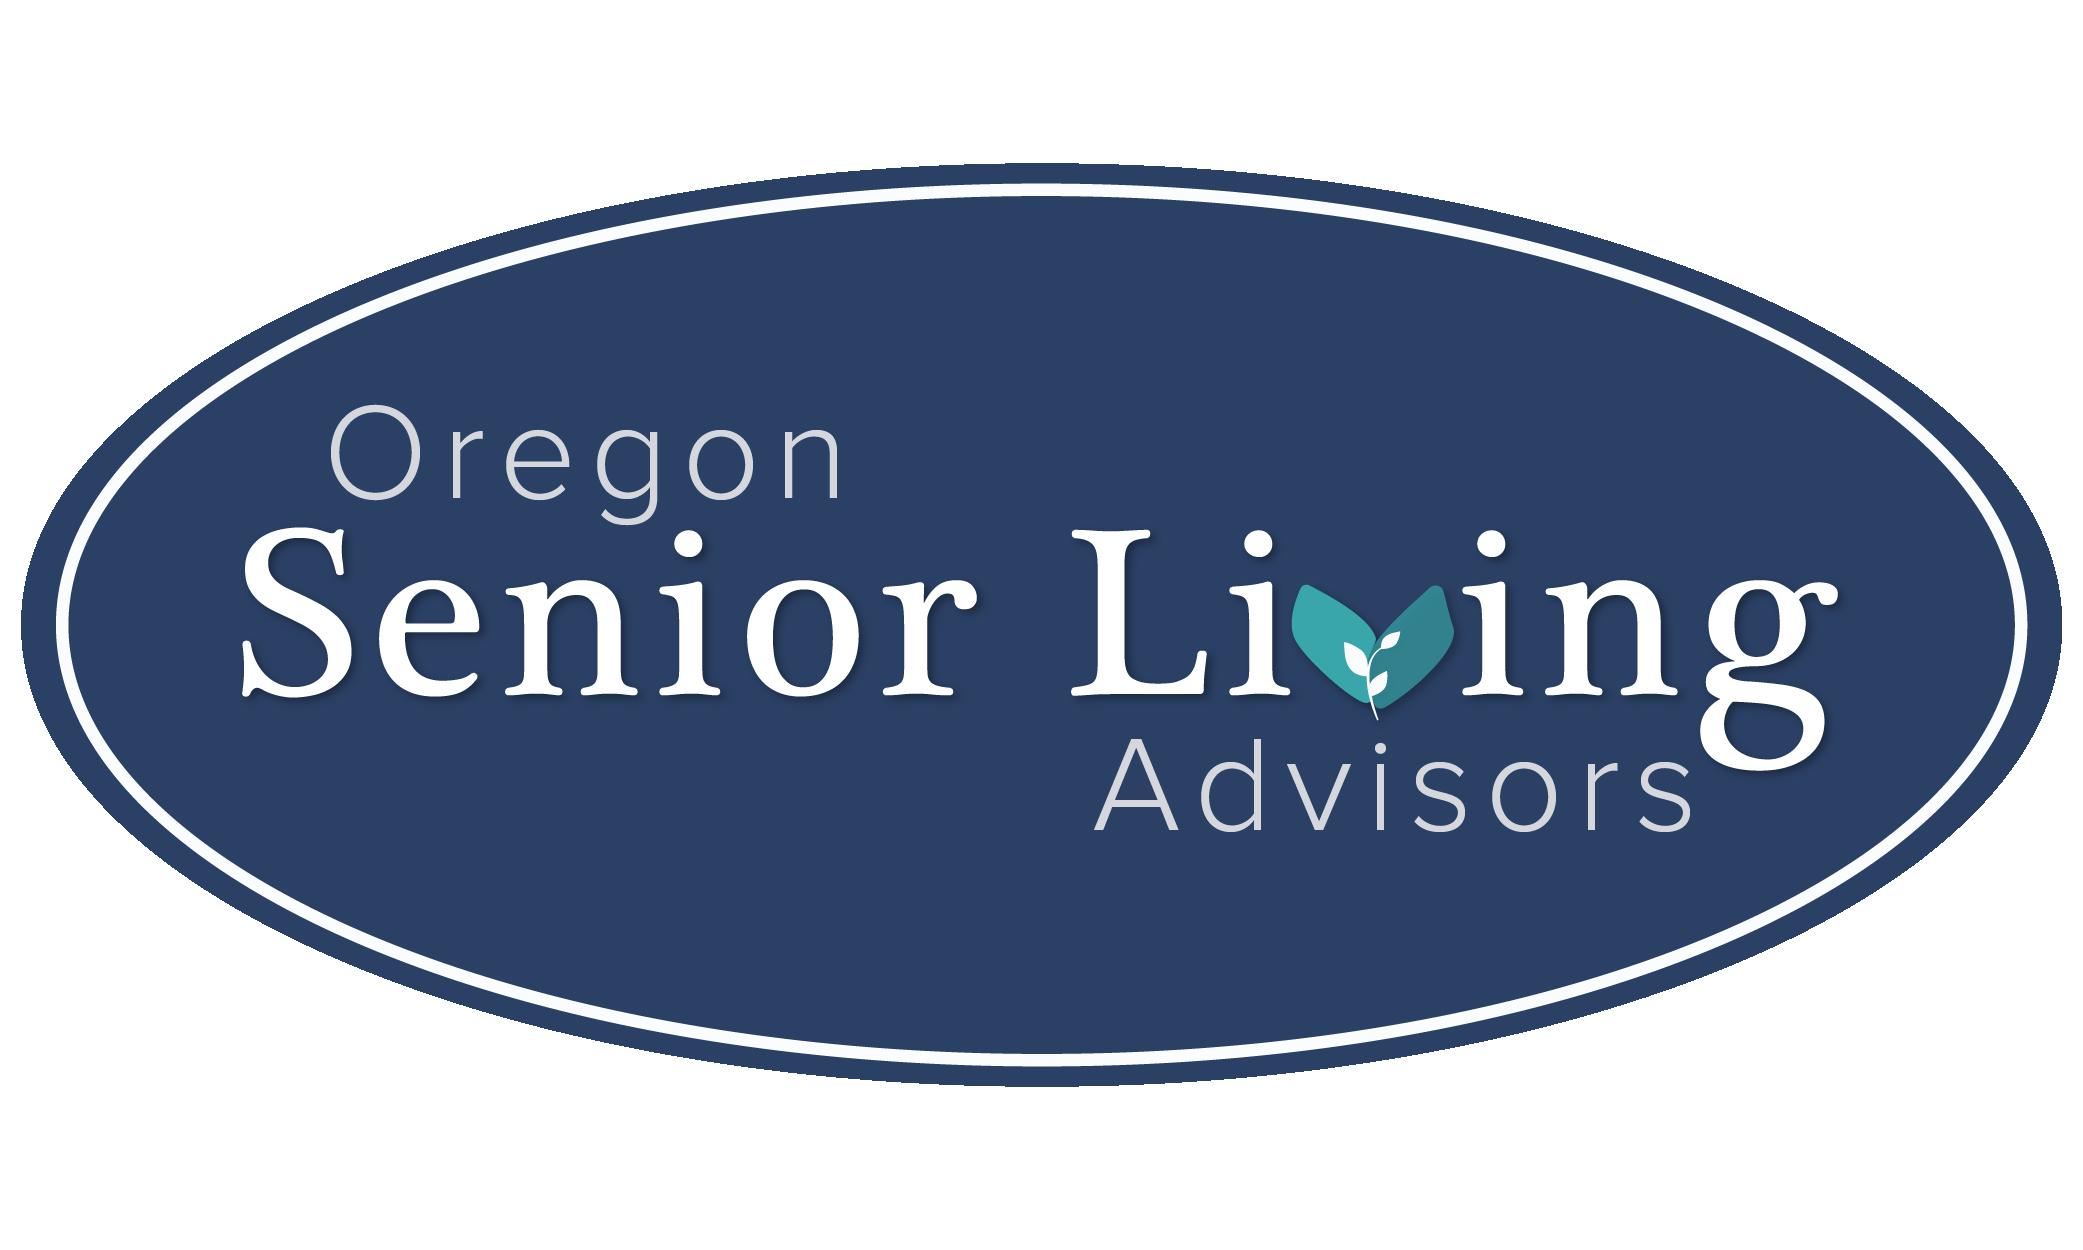 Oregon Senior Living Advisors, Main Logo Design by Brightly and Co